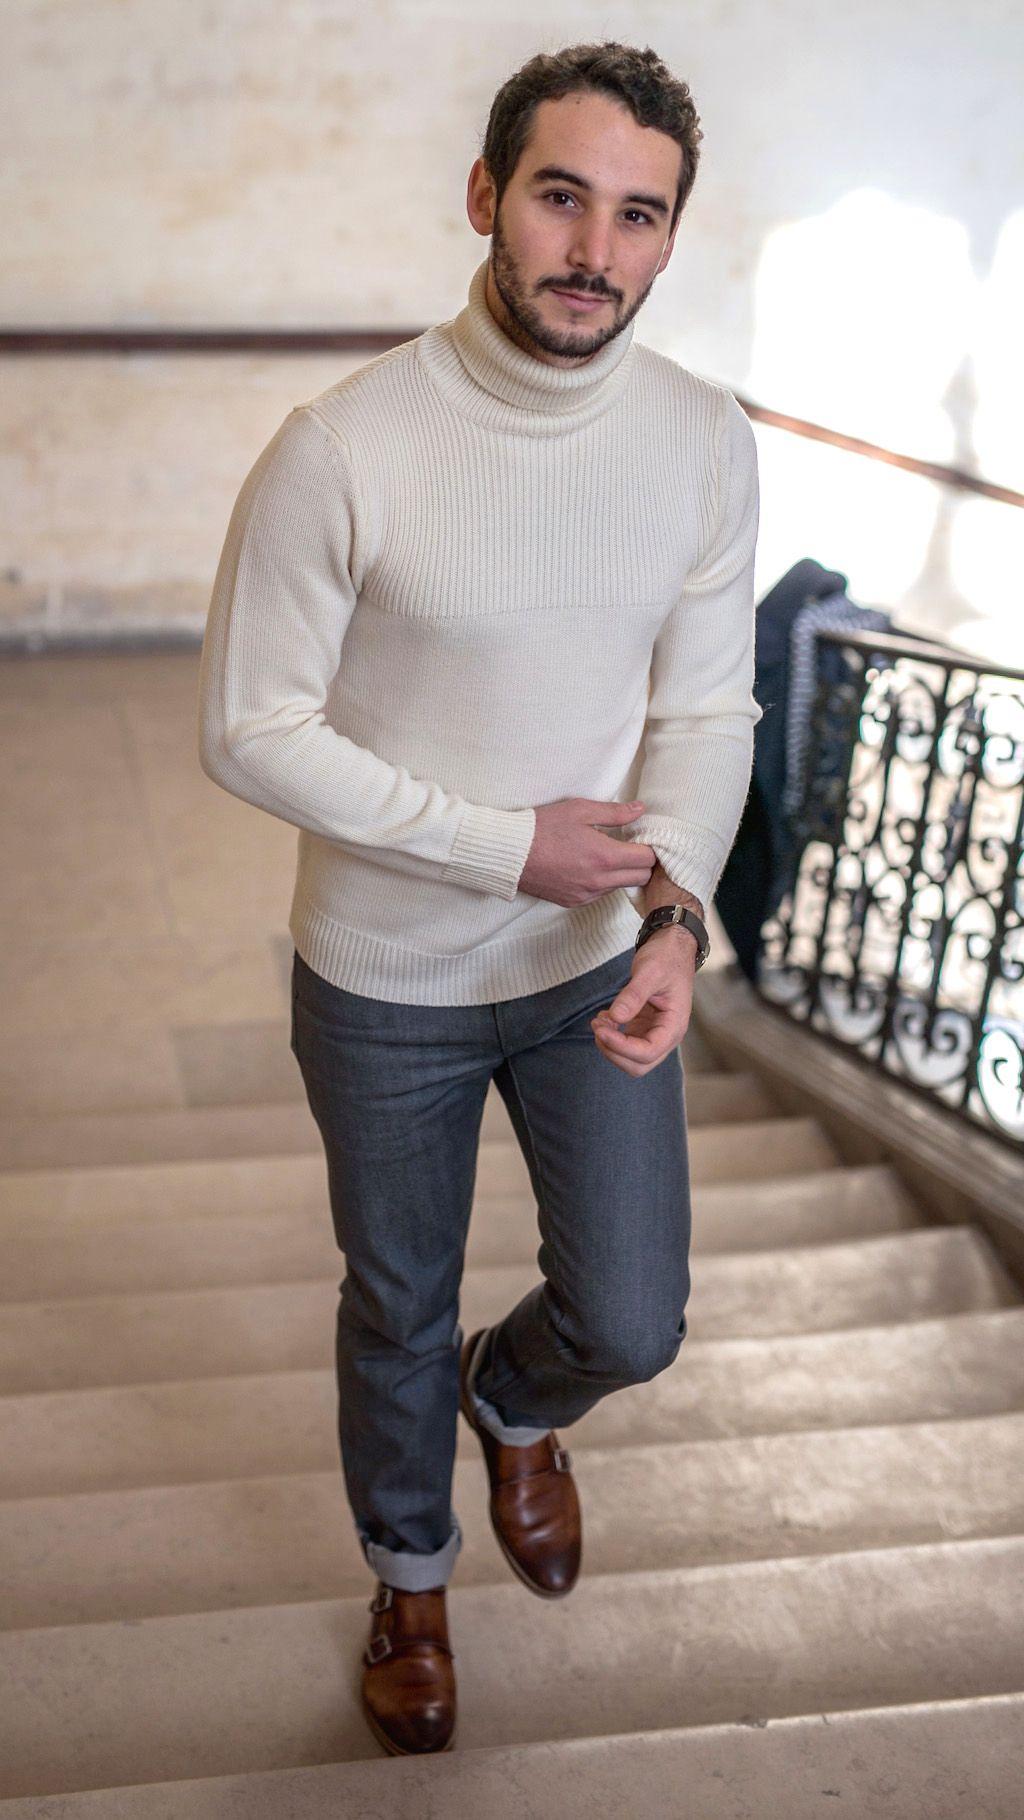 thomas porte un pull col roul agn s b les influenceurs. Black Bedroom Furniture Sets. Home Design Ideas